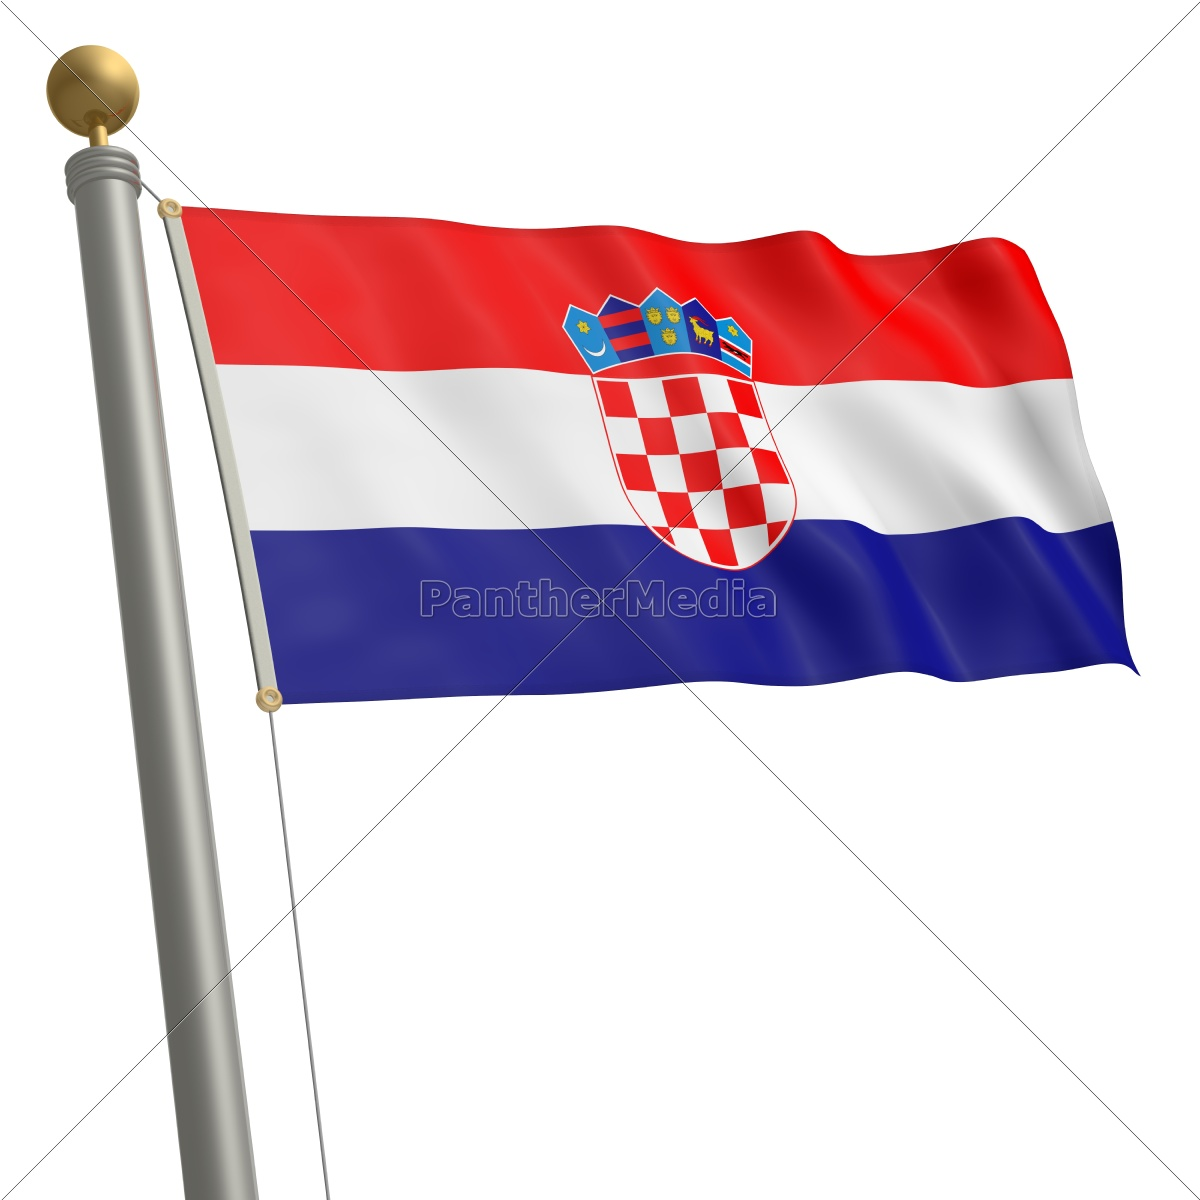 flagge von kroatien lizenzfreies foto 9341104. Black Bedroom Furniture Sets. Home Design Ideas